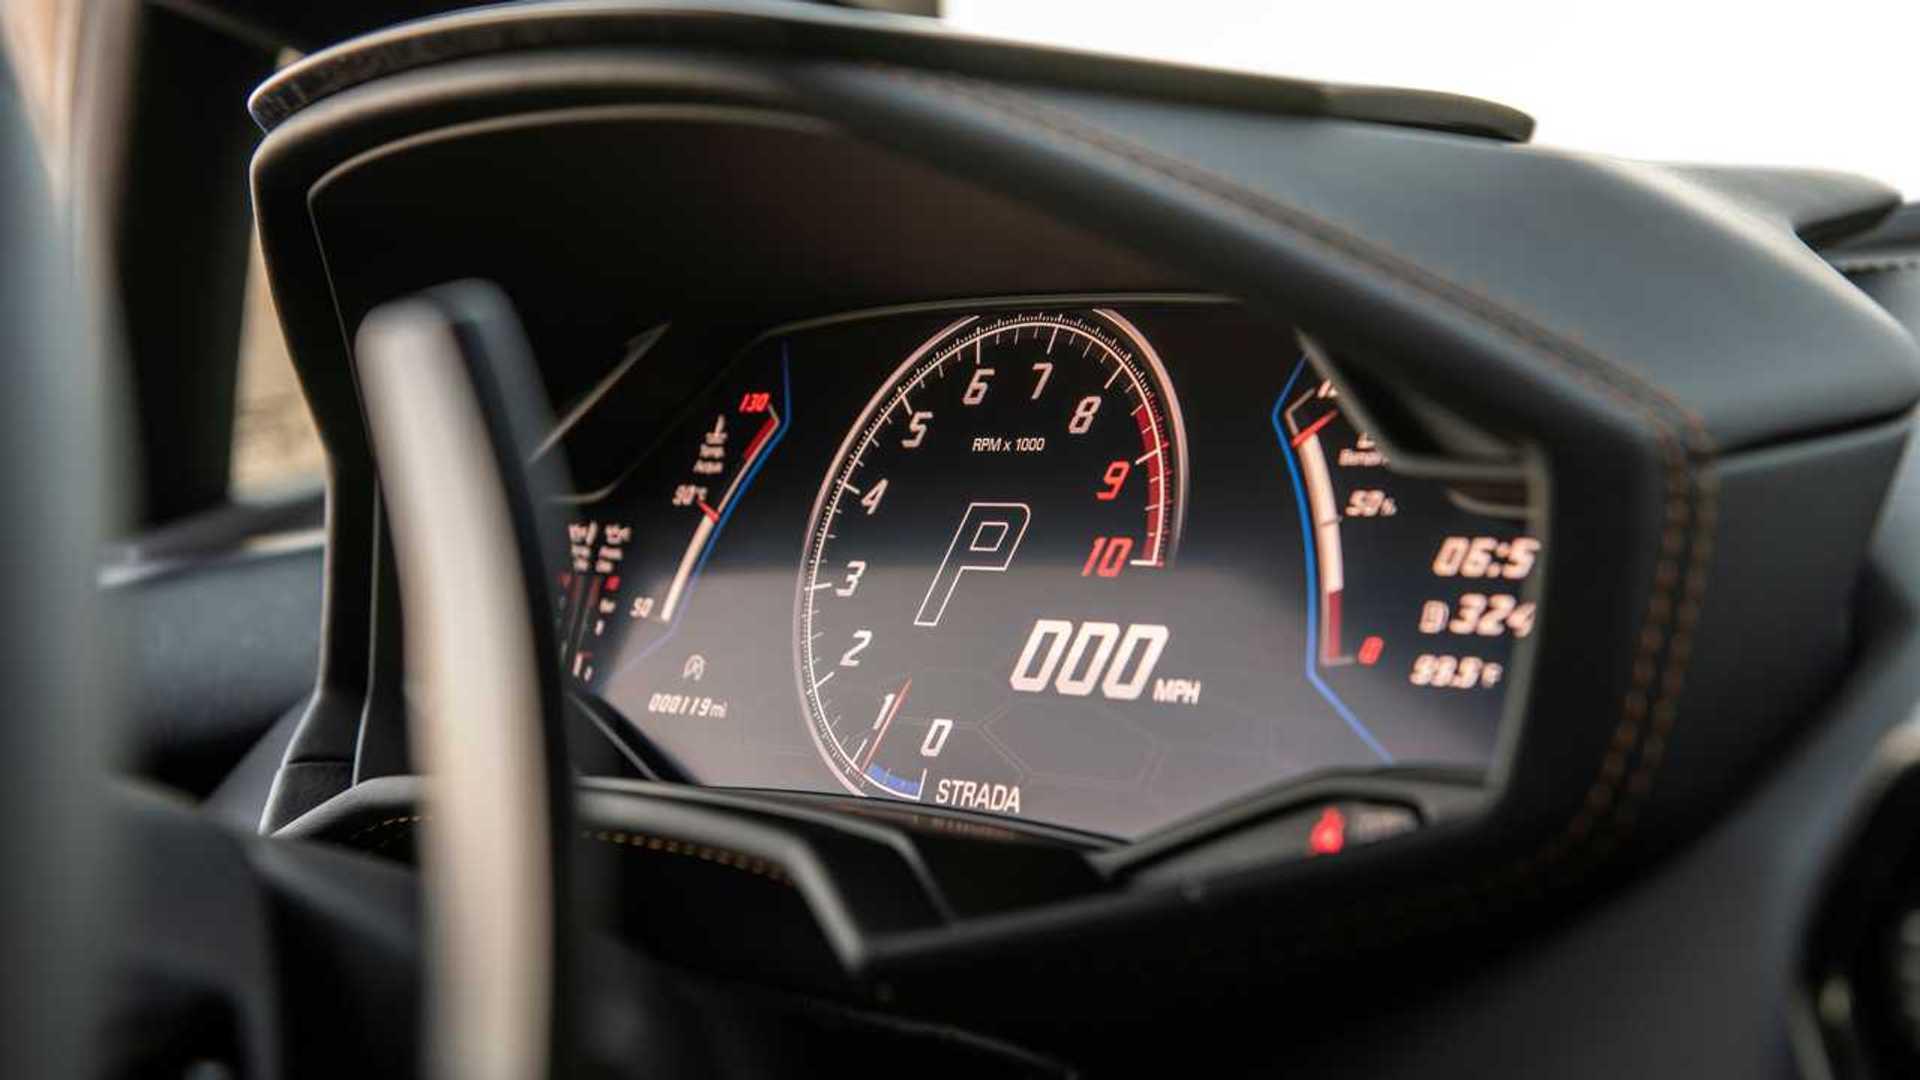 2020 Lamborghini Huracan Evo RWD gauges